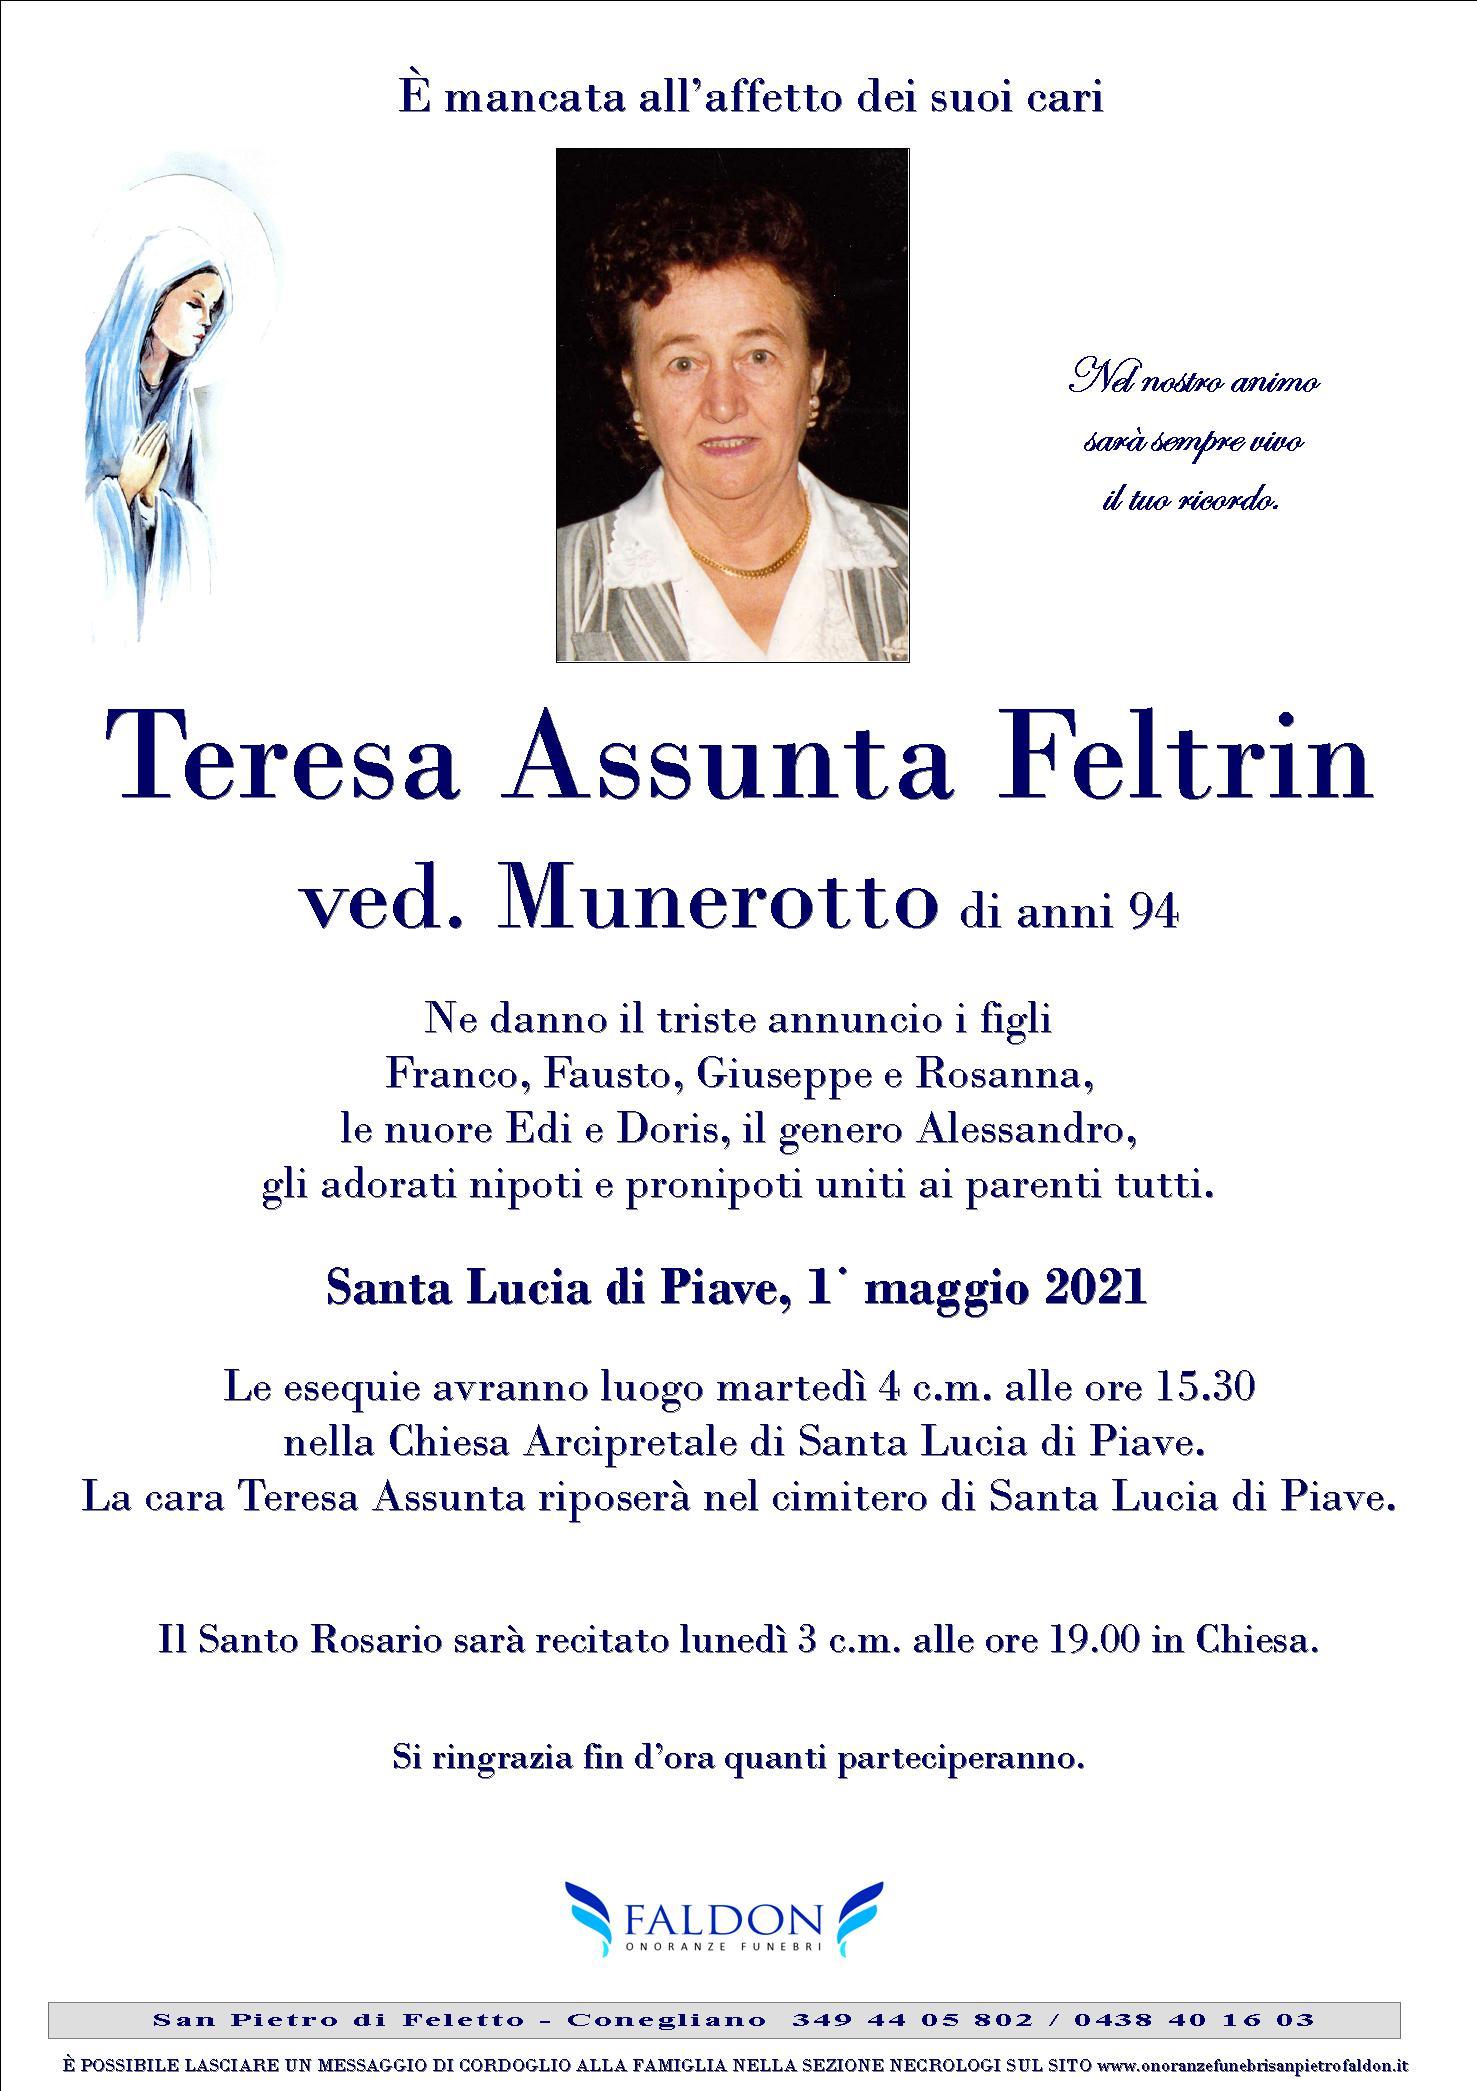 Teresa Assunta Feltrin